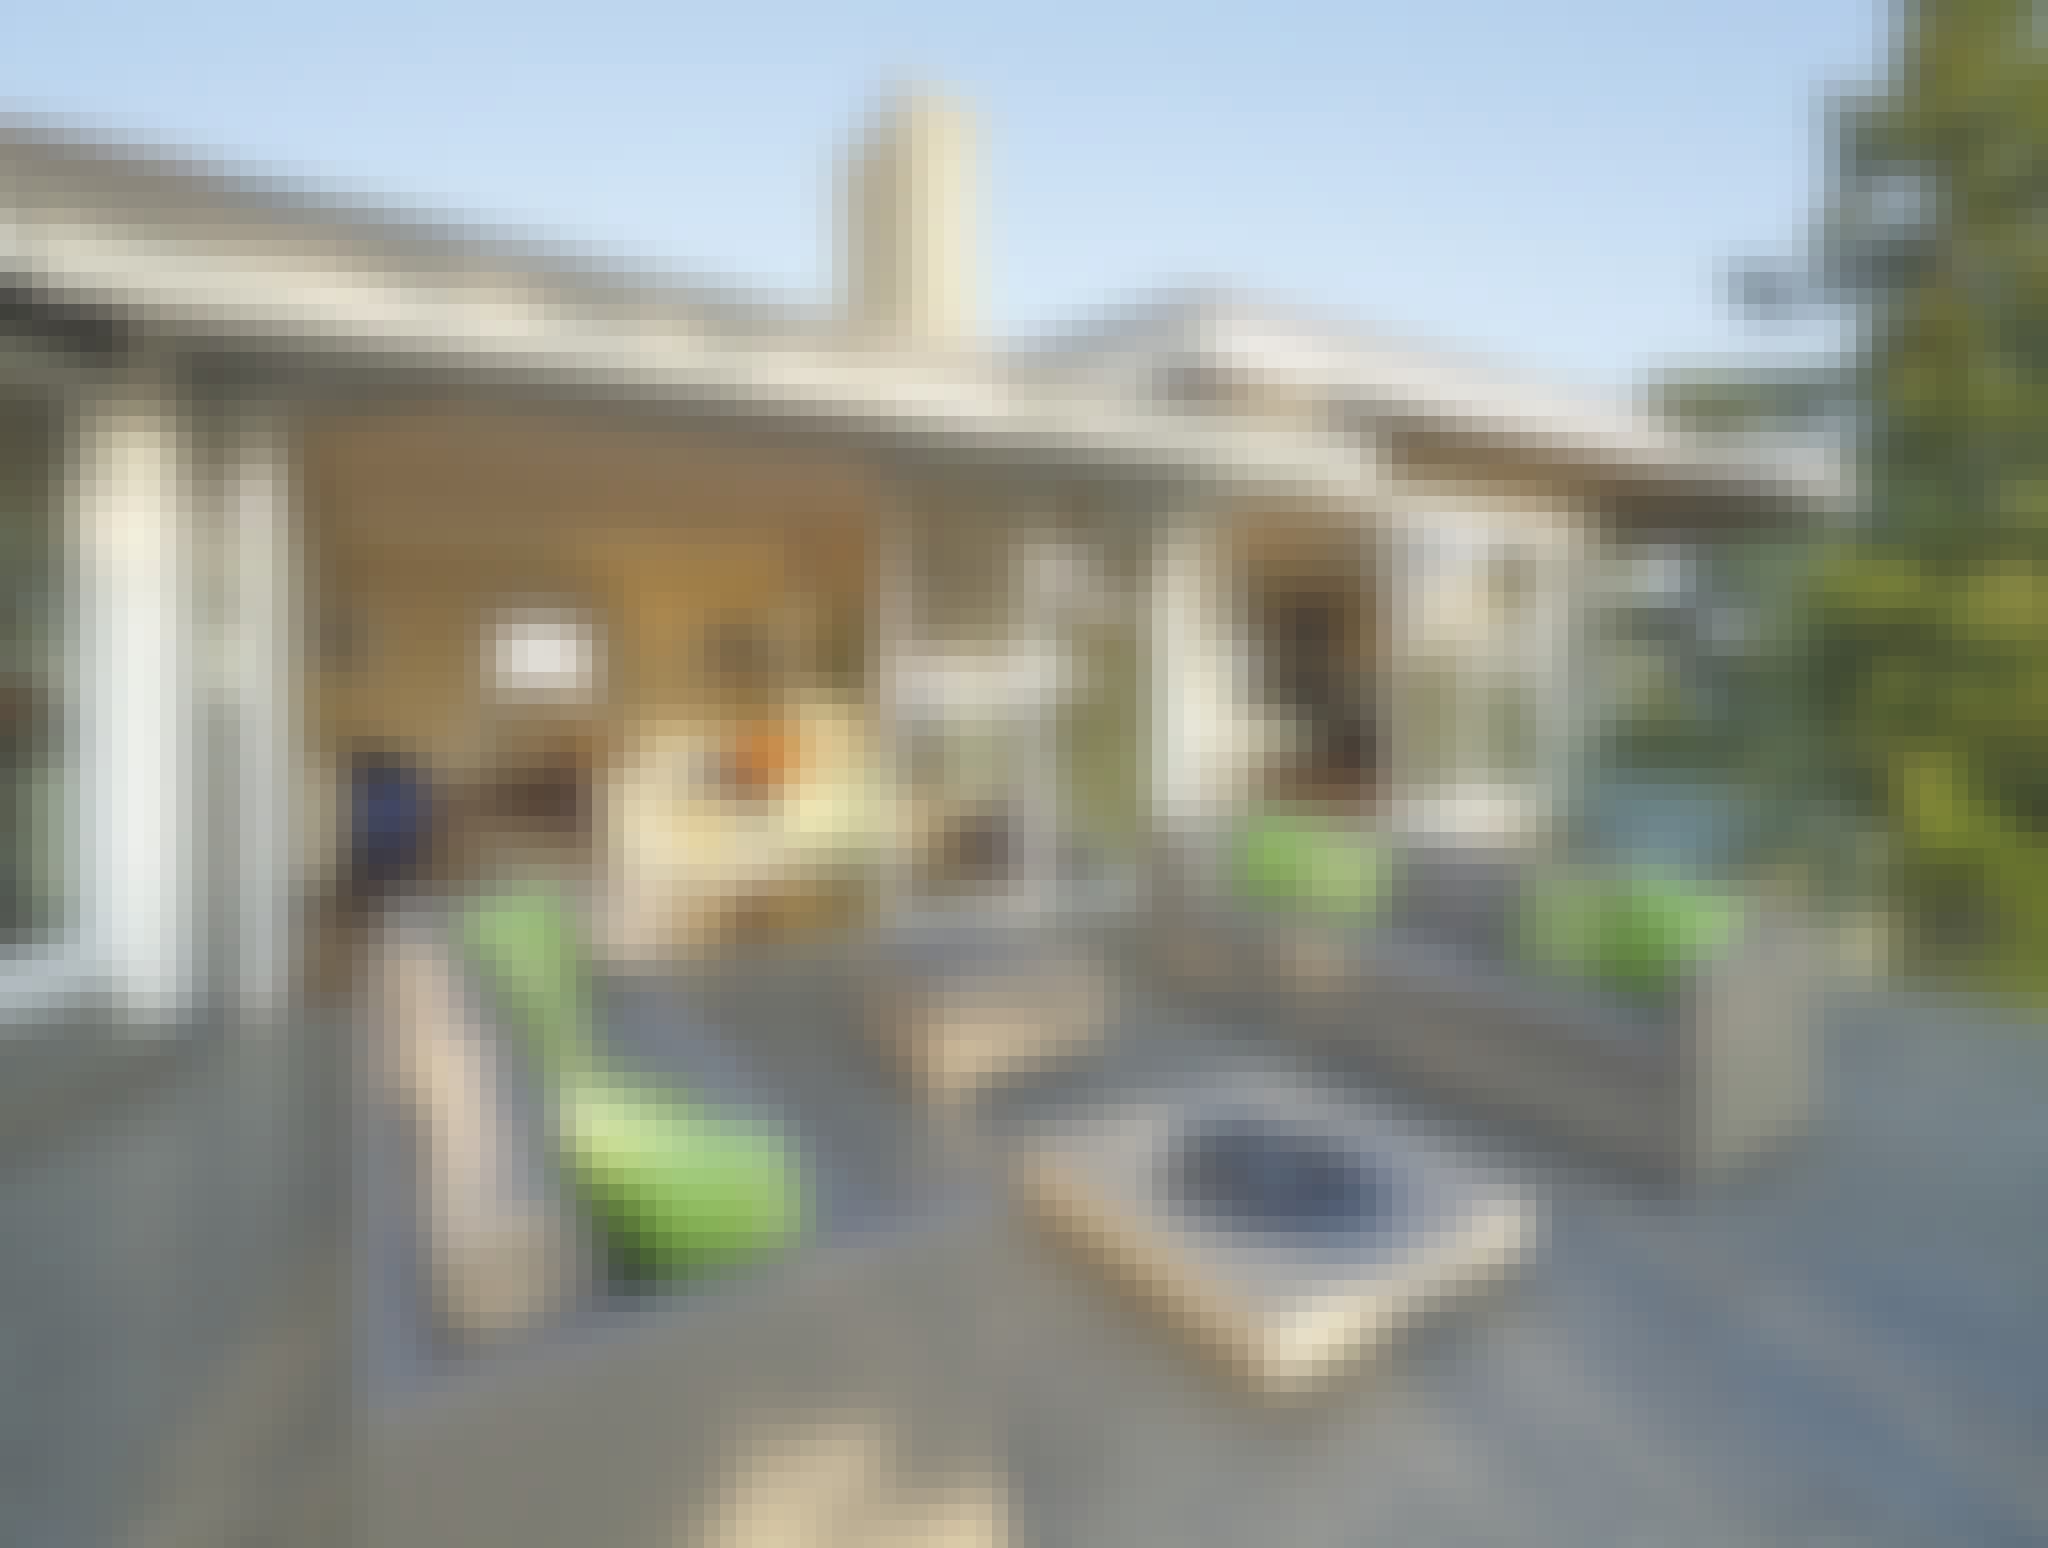 indoor/outdoor living with sliding glass door systems